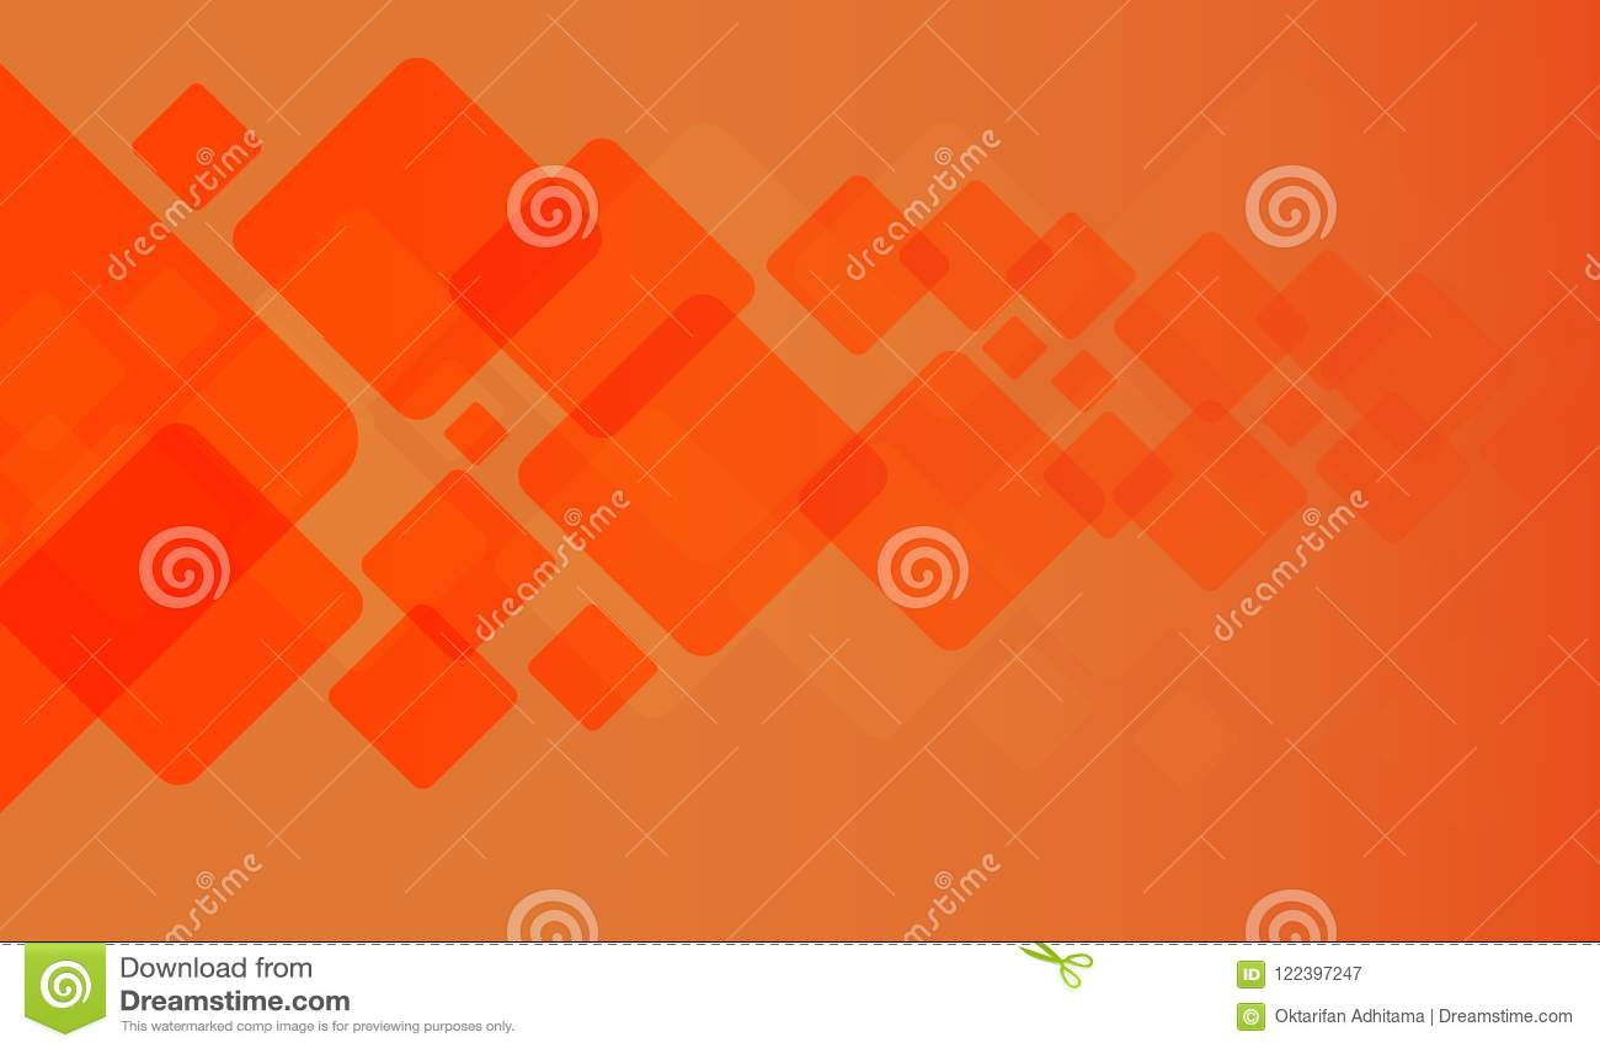 Textura geométrica com fundo alaranjado